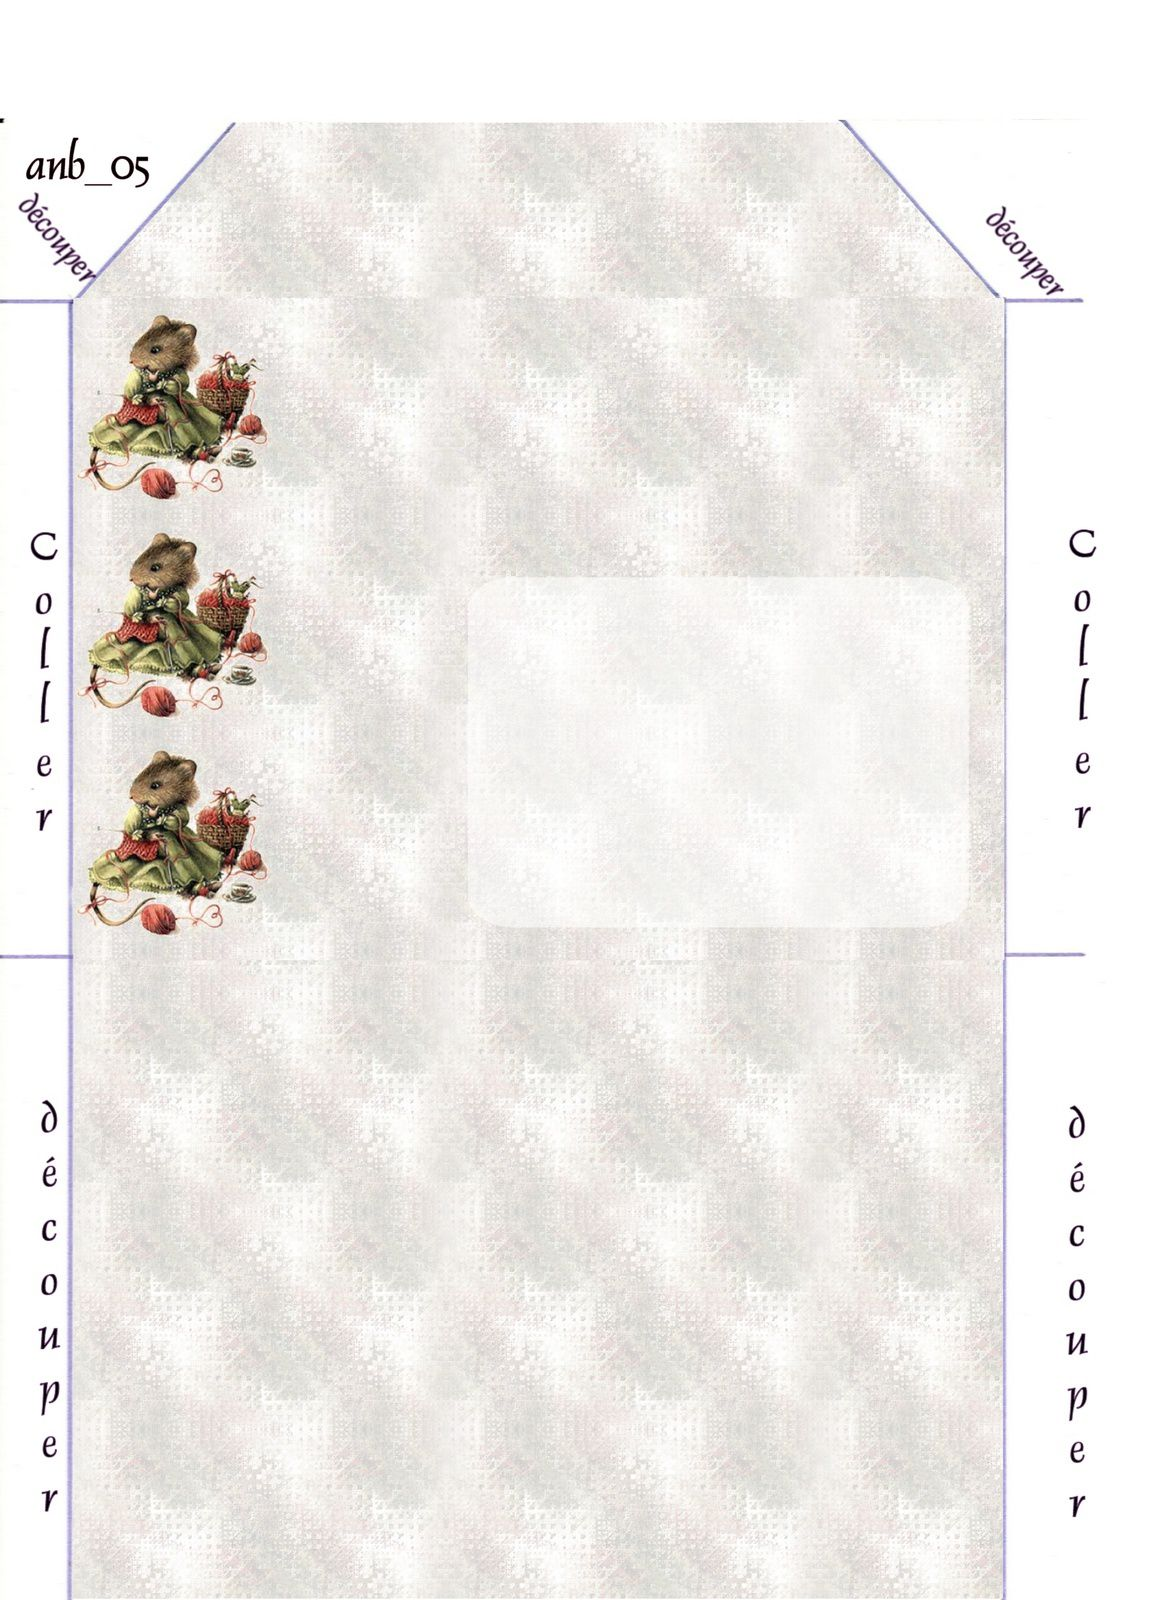 Veramouse tricot Incredimail &amp&#x3B; Papier A4 h l &amp&#x3B; outlook &amp&#x3B; enveloppe &amp&#x3B; 2 cartes A5 &amp&#x3B; signets veramouse_tricot_00